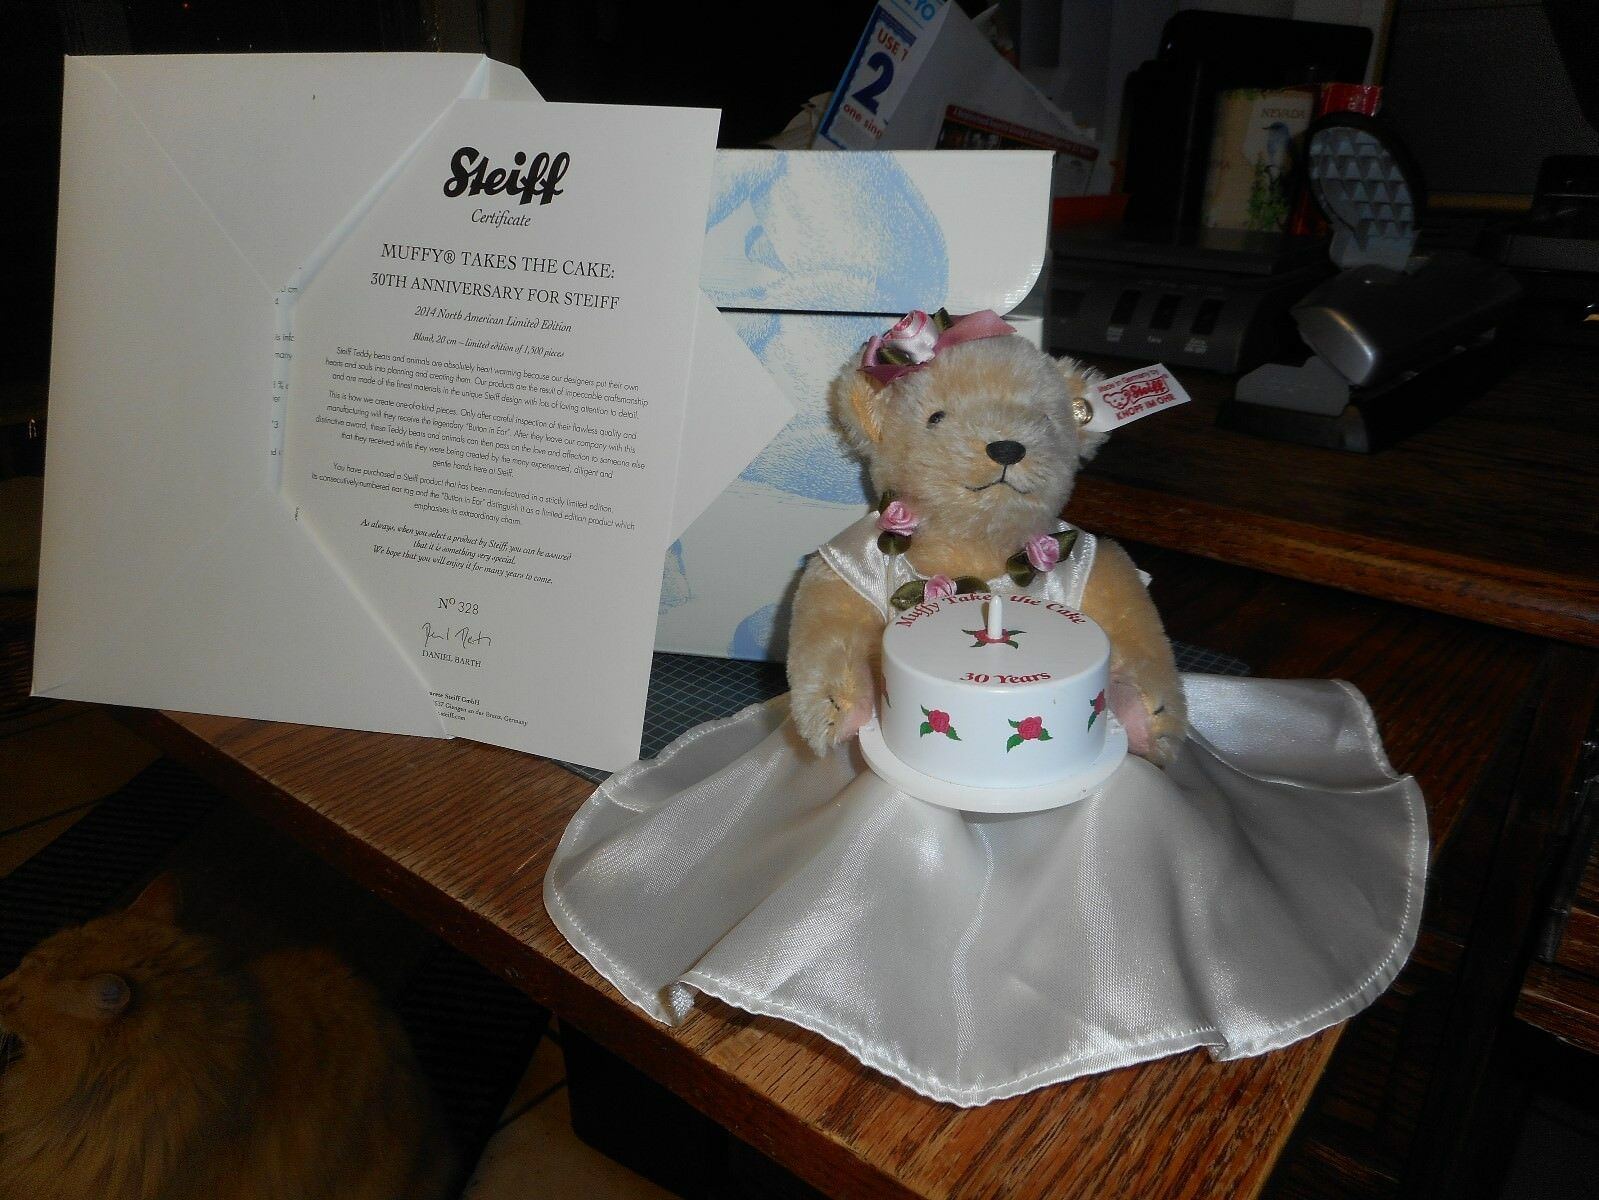 MIB STEIFF 30TH ANNIVERSARY MUFFY VANDERBEAR TAKES THE CAKE 2014  LTD EAN 682841